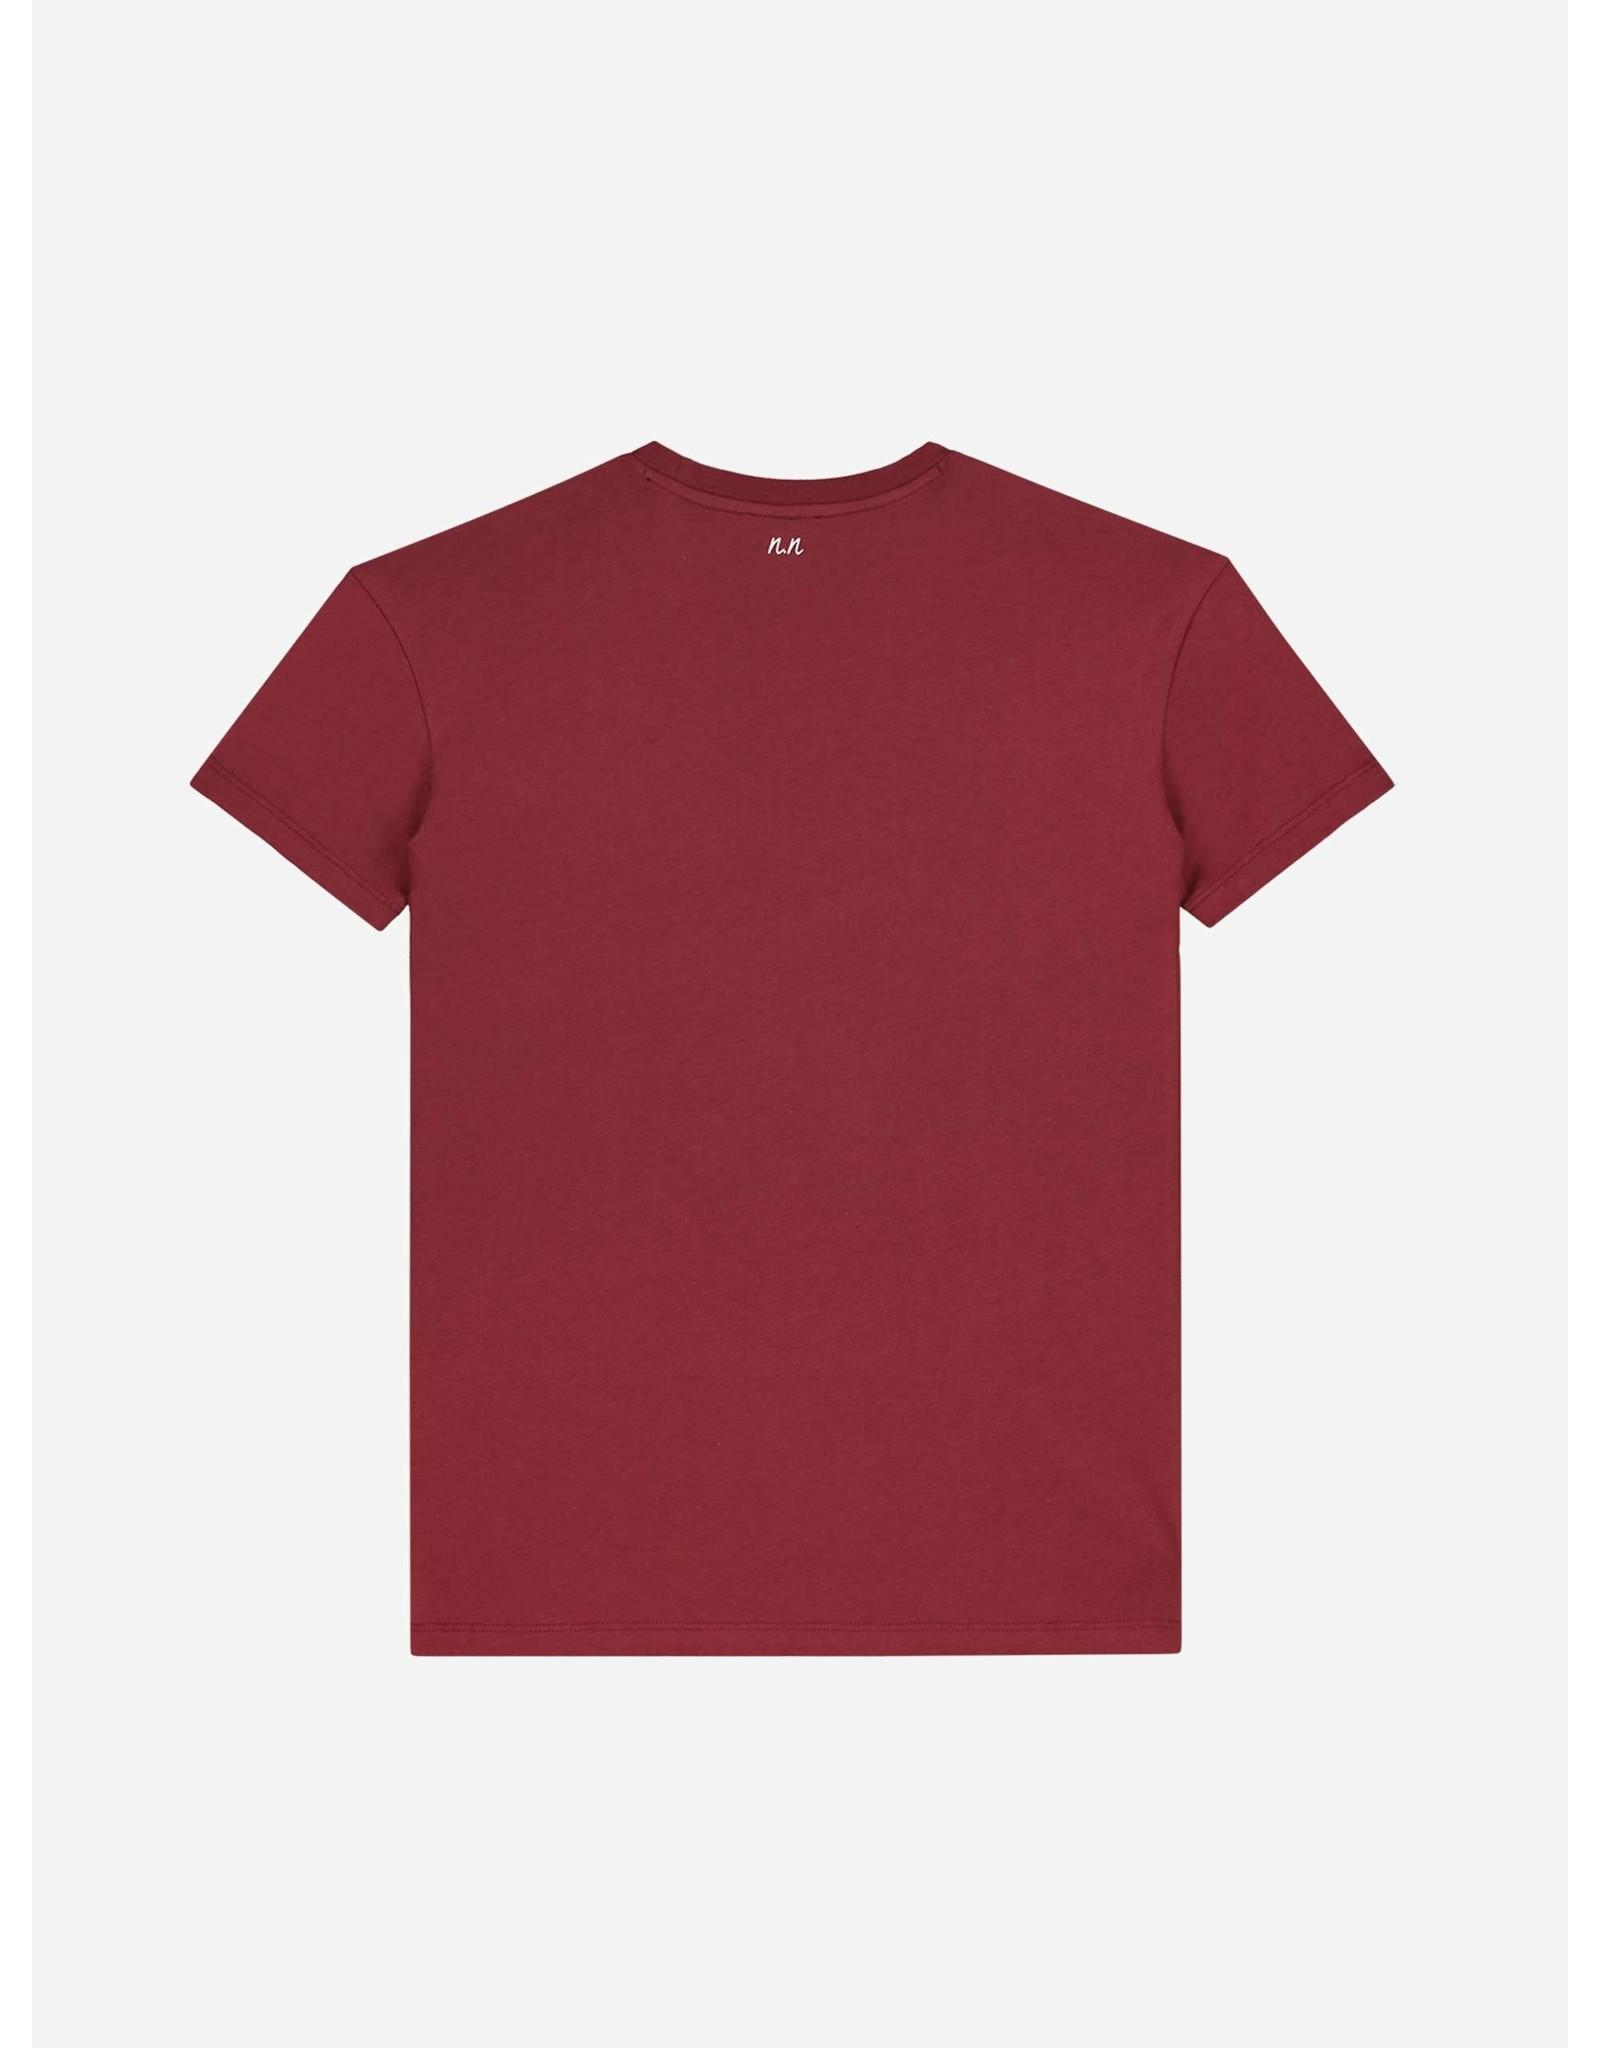 Nik & Nik Lutz T-Shirt Mid Red